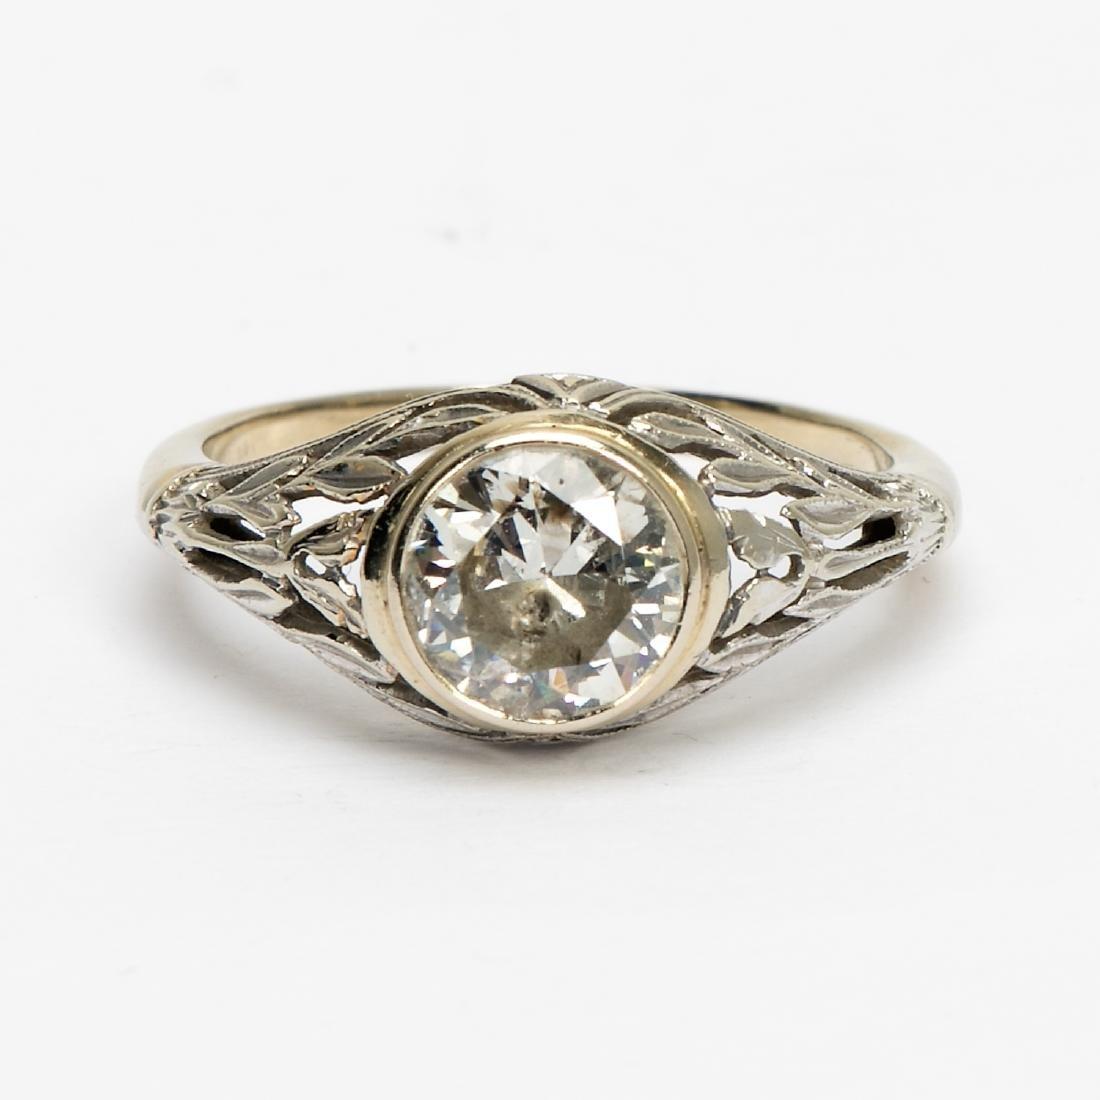 Antique Art Deco c.1920's White Gold Diamond Ring